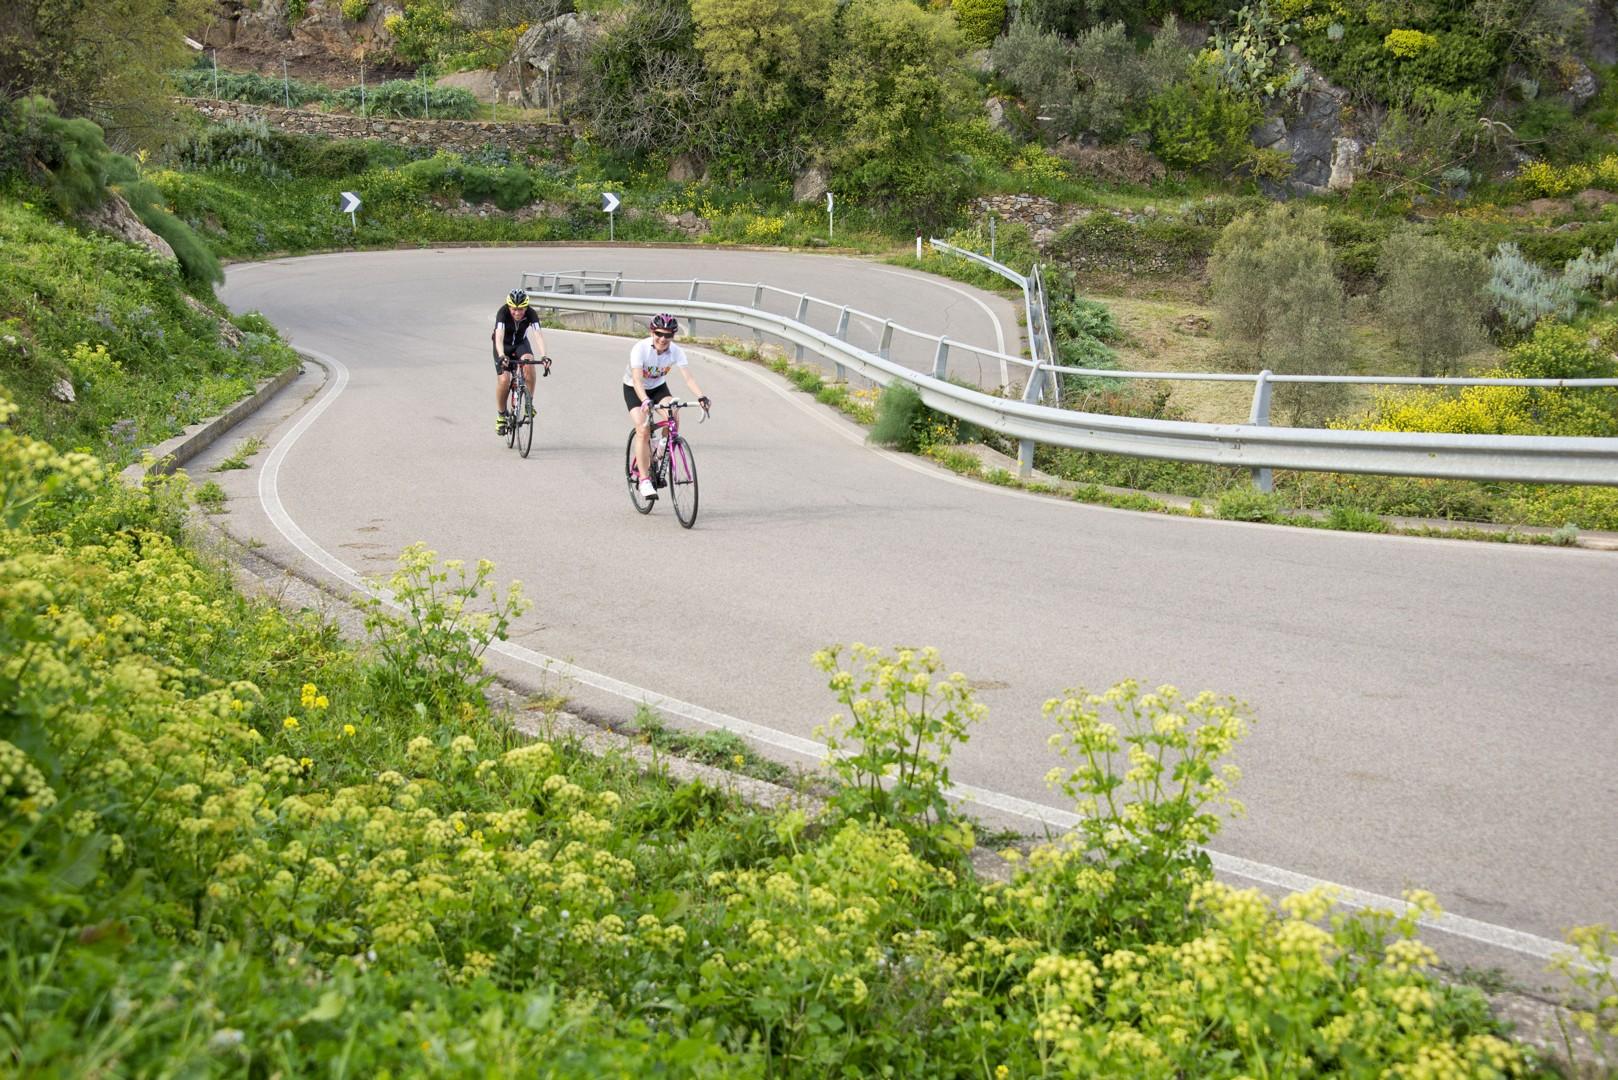 FCD6131.jpg - Italy - Sardinia - Mountain Explorer - Guided Road Cycling Holiday - Italia Road Cycling